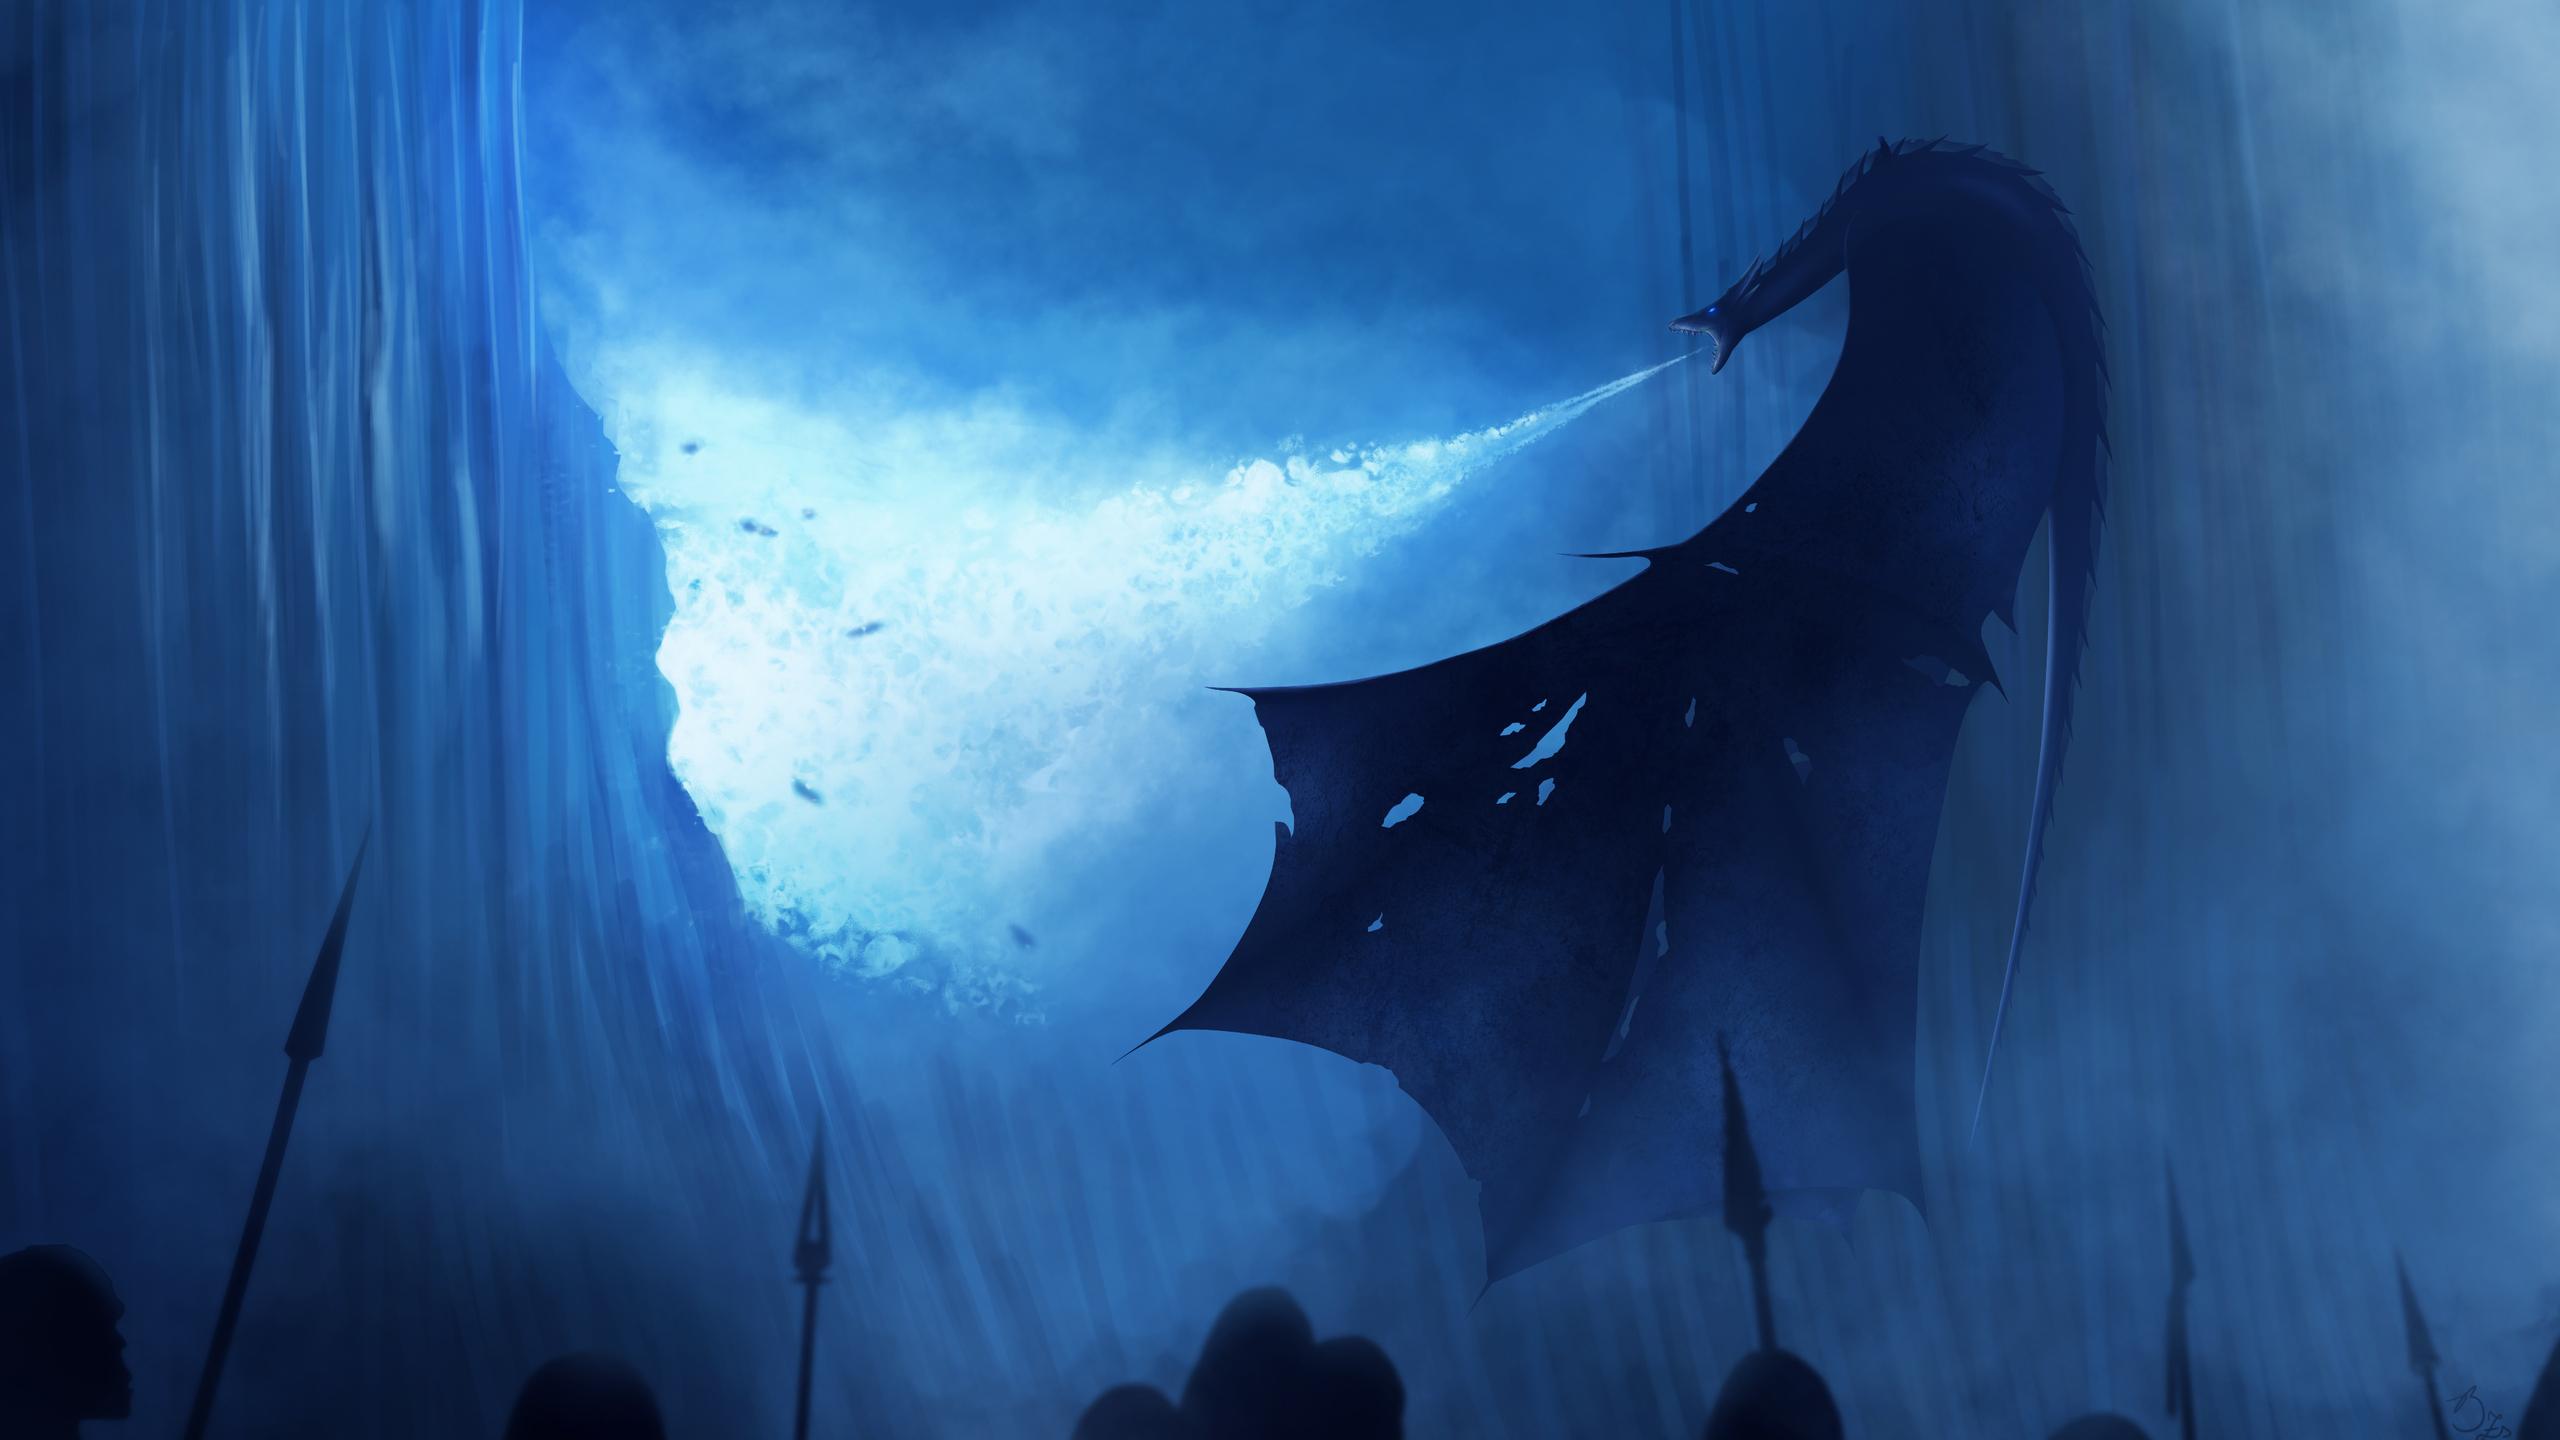 2560x1440 White Walker Dragon Breaking The Wall 1440P ...